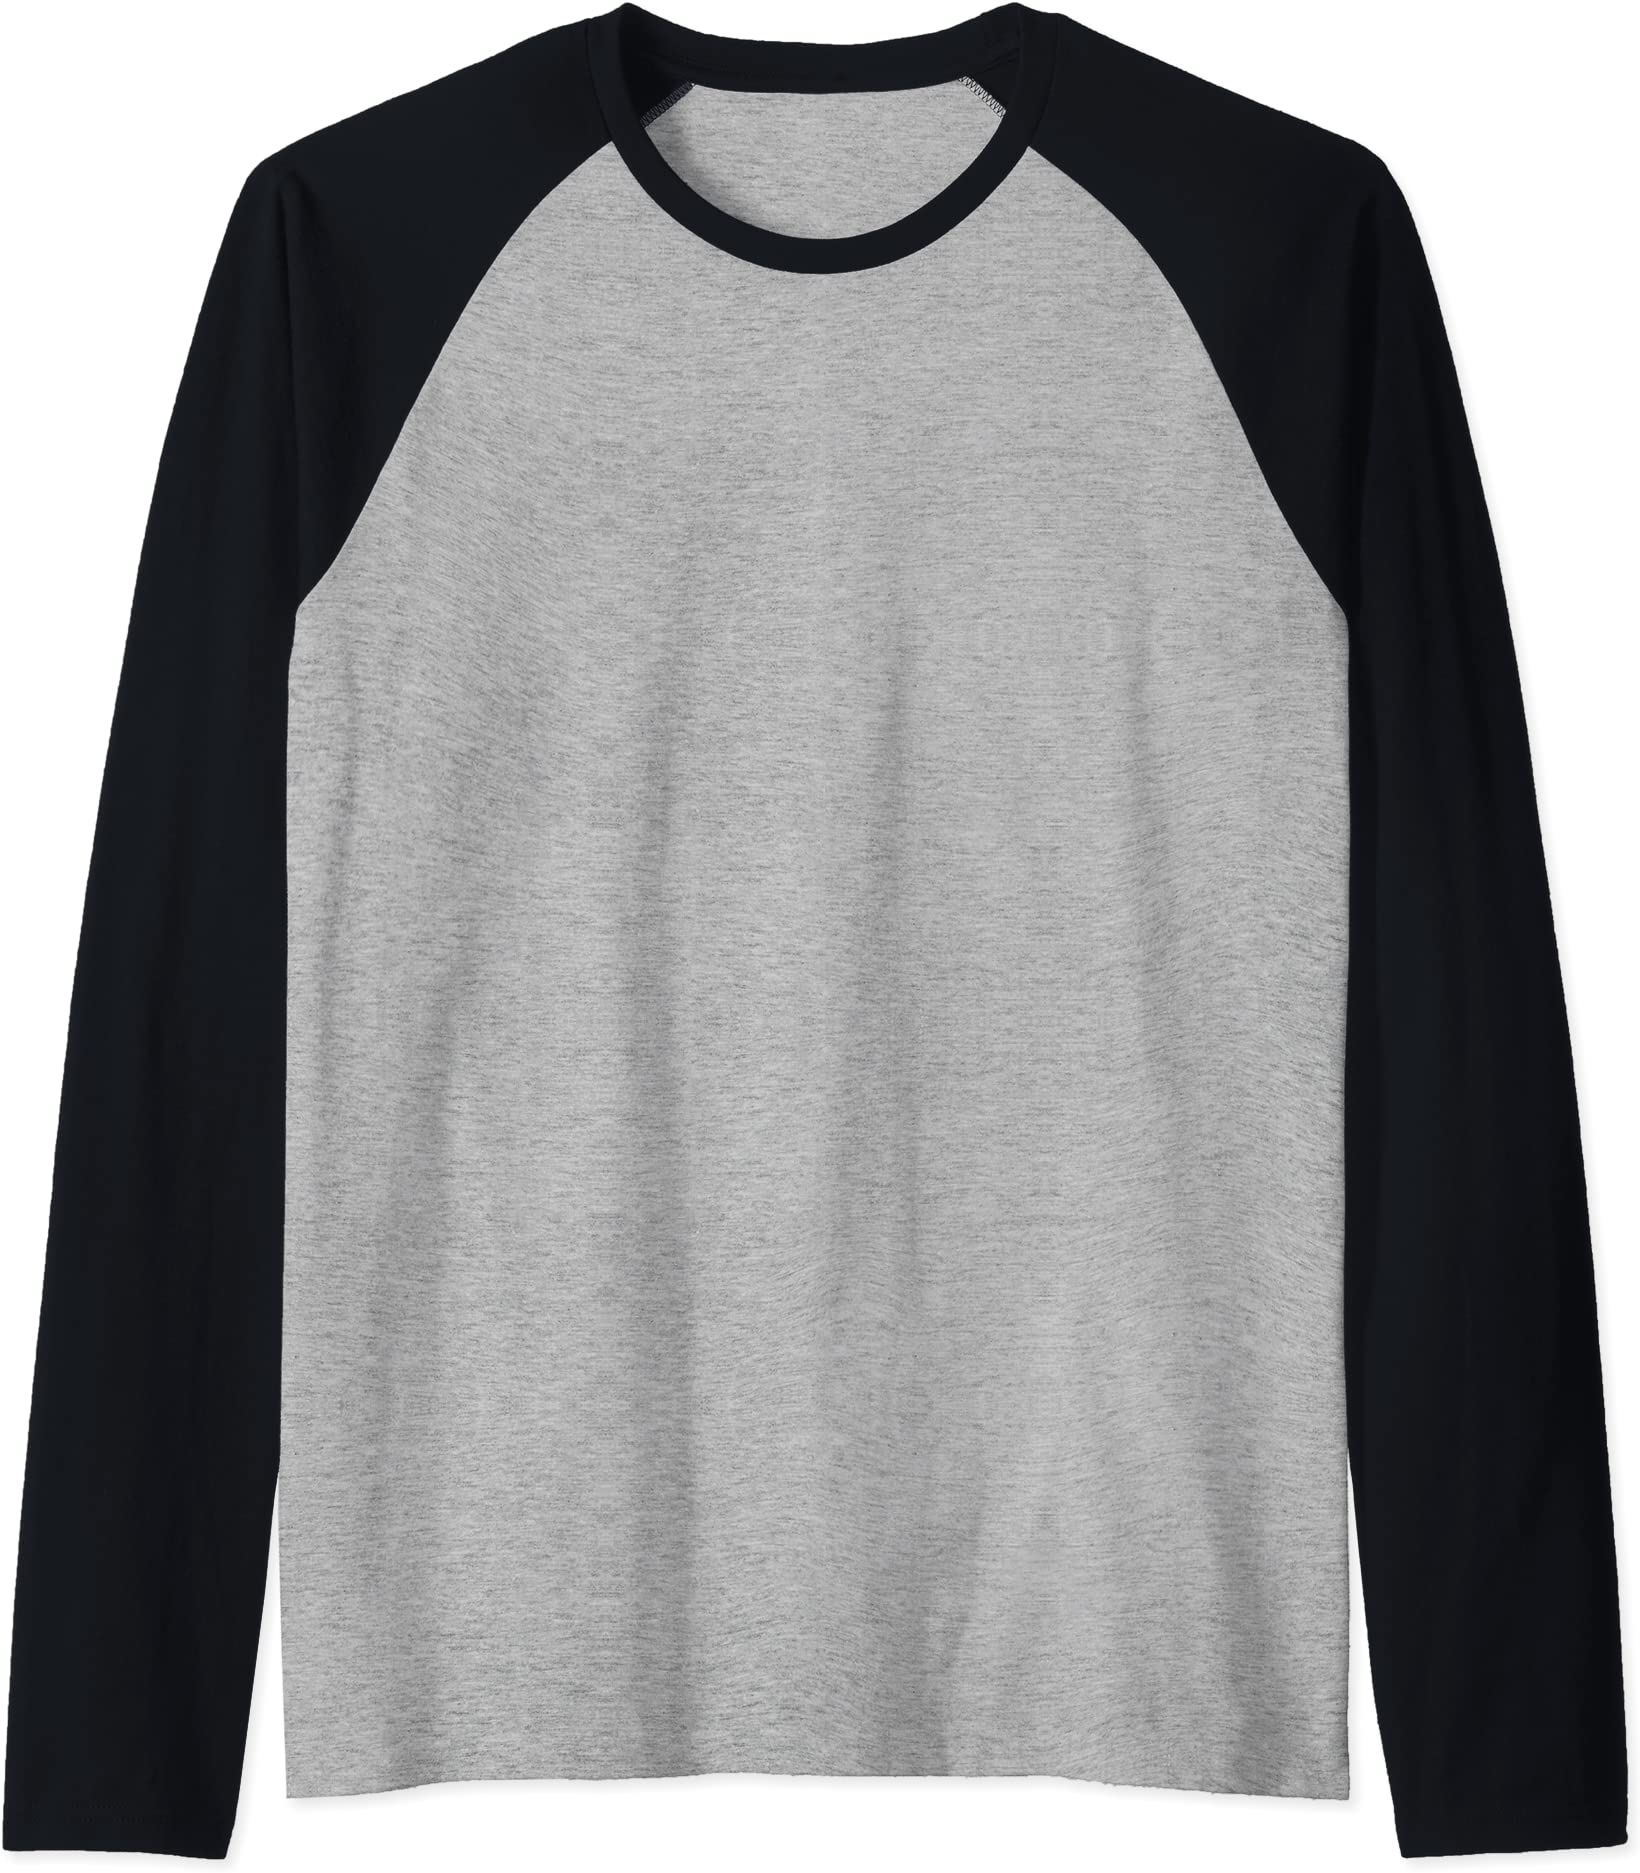 BU2H Men Simple Short Sleeve Summer Colorblock Leisure Stitch Polo Shirt